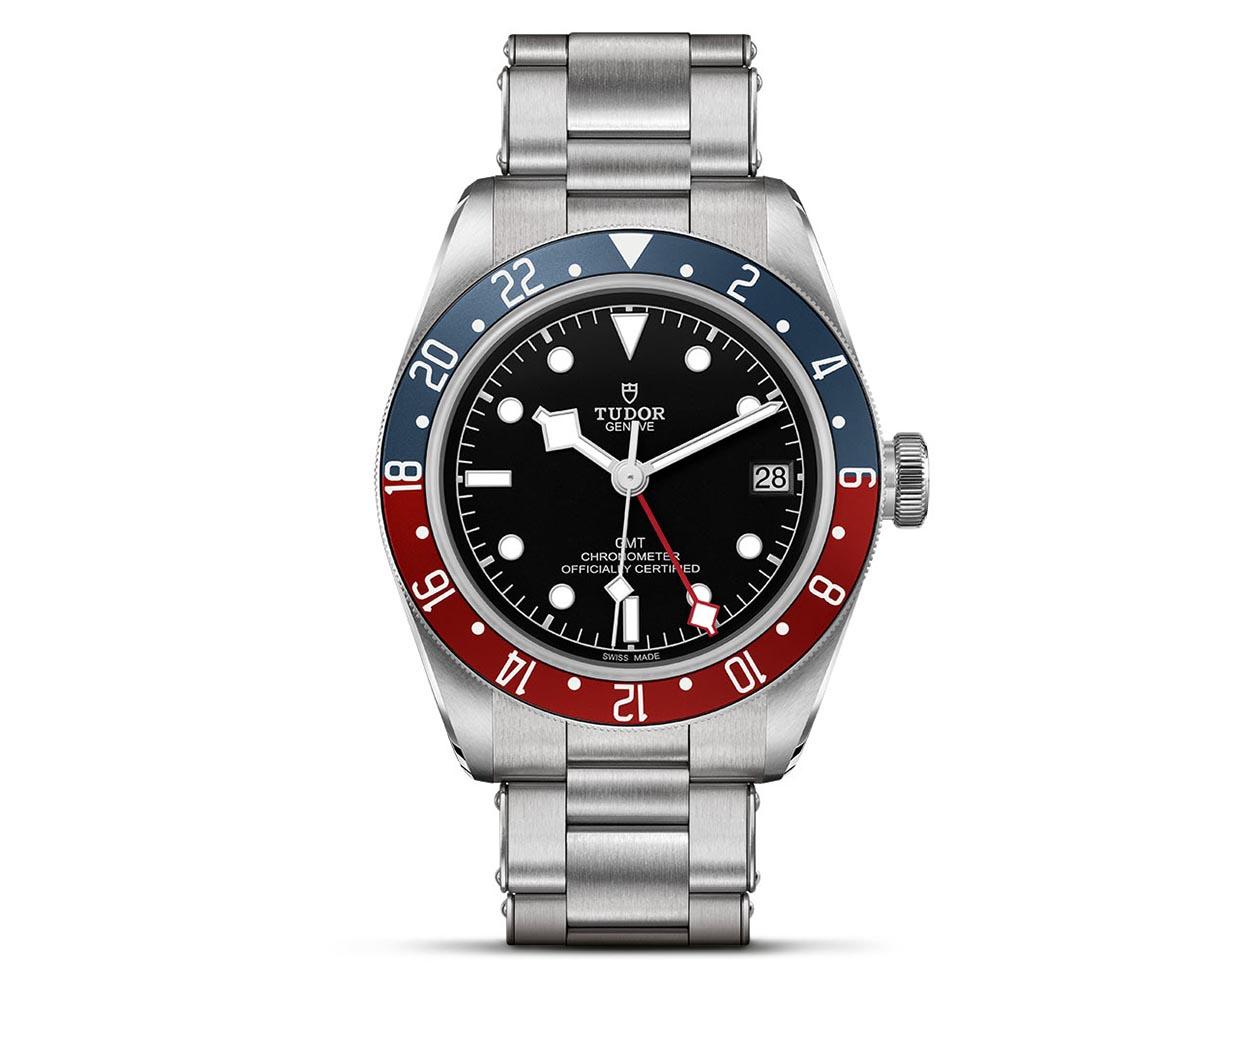 TUDOR Black Bay GMT M79830RB 0001 FINAL